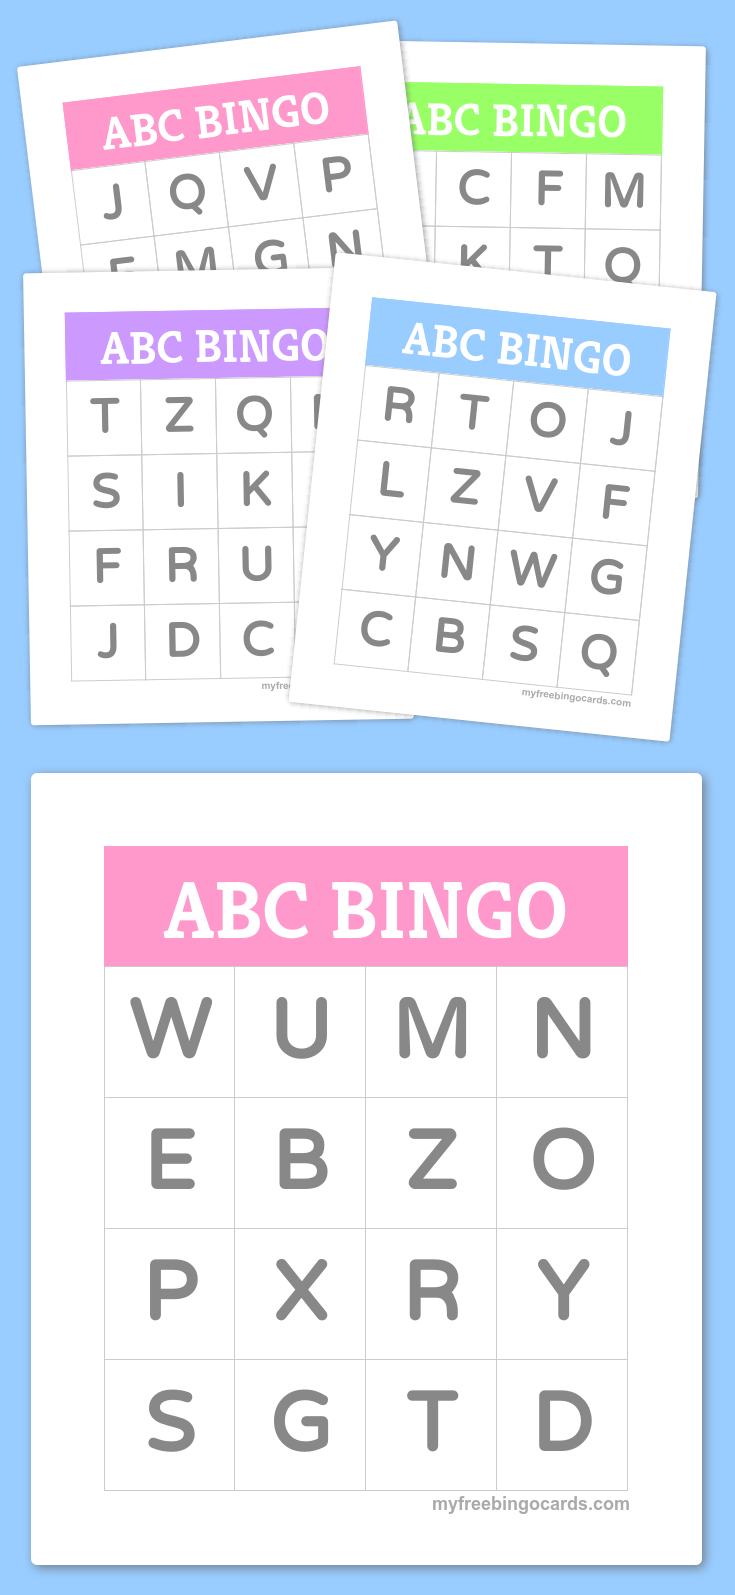 Free Printable Bingo Cards | Bingo Cards | Pinterest | Preschool - Free Printable Alphabet Bingo Cards